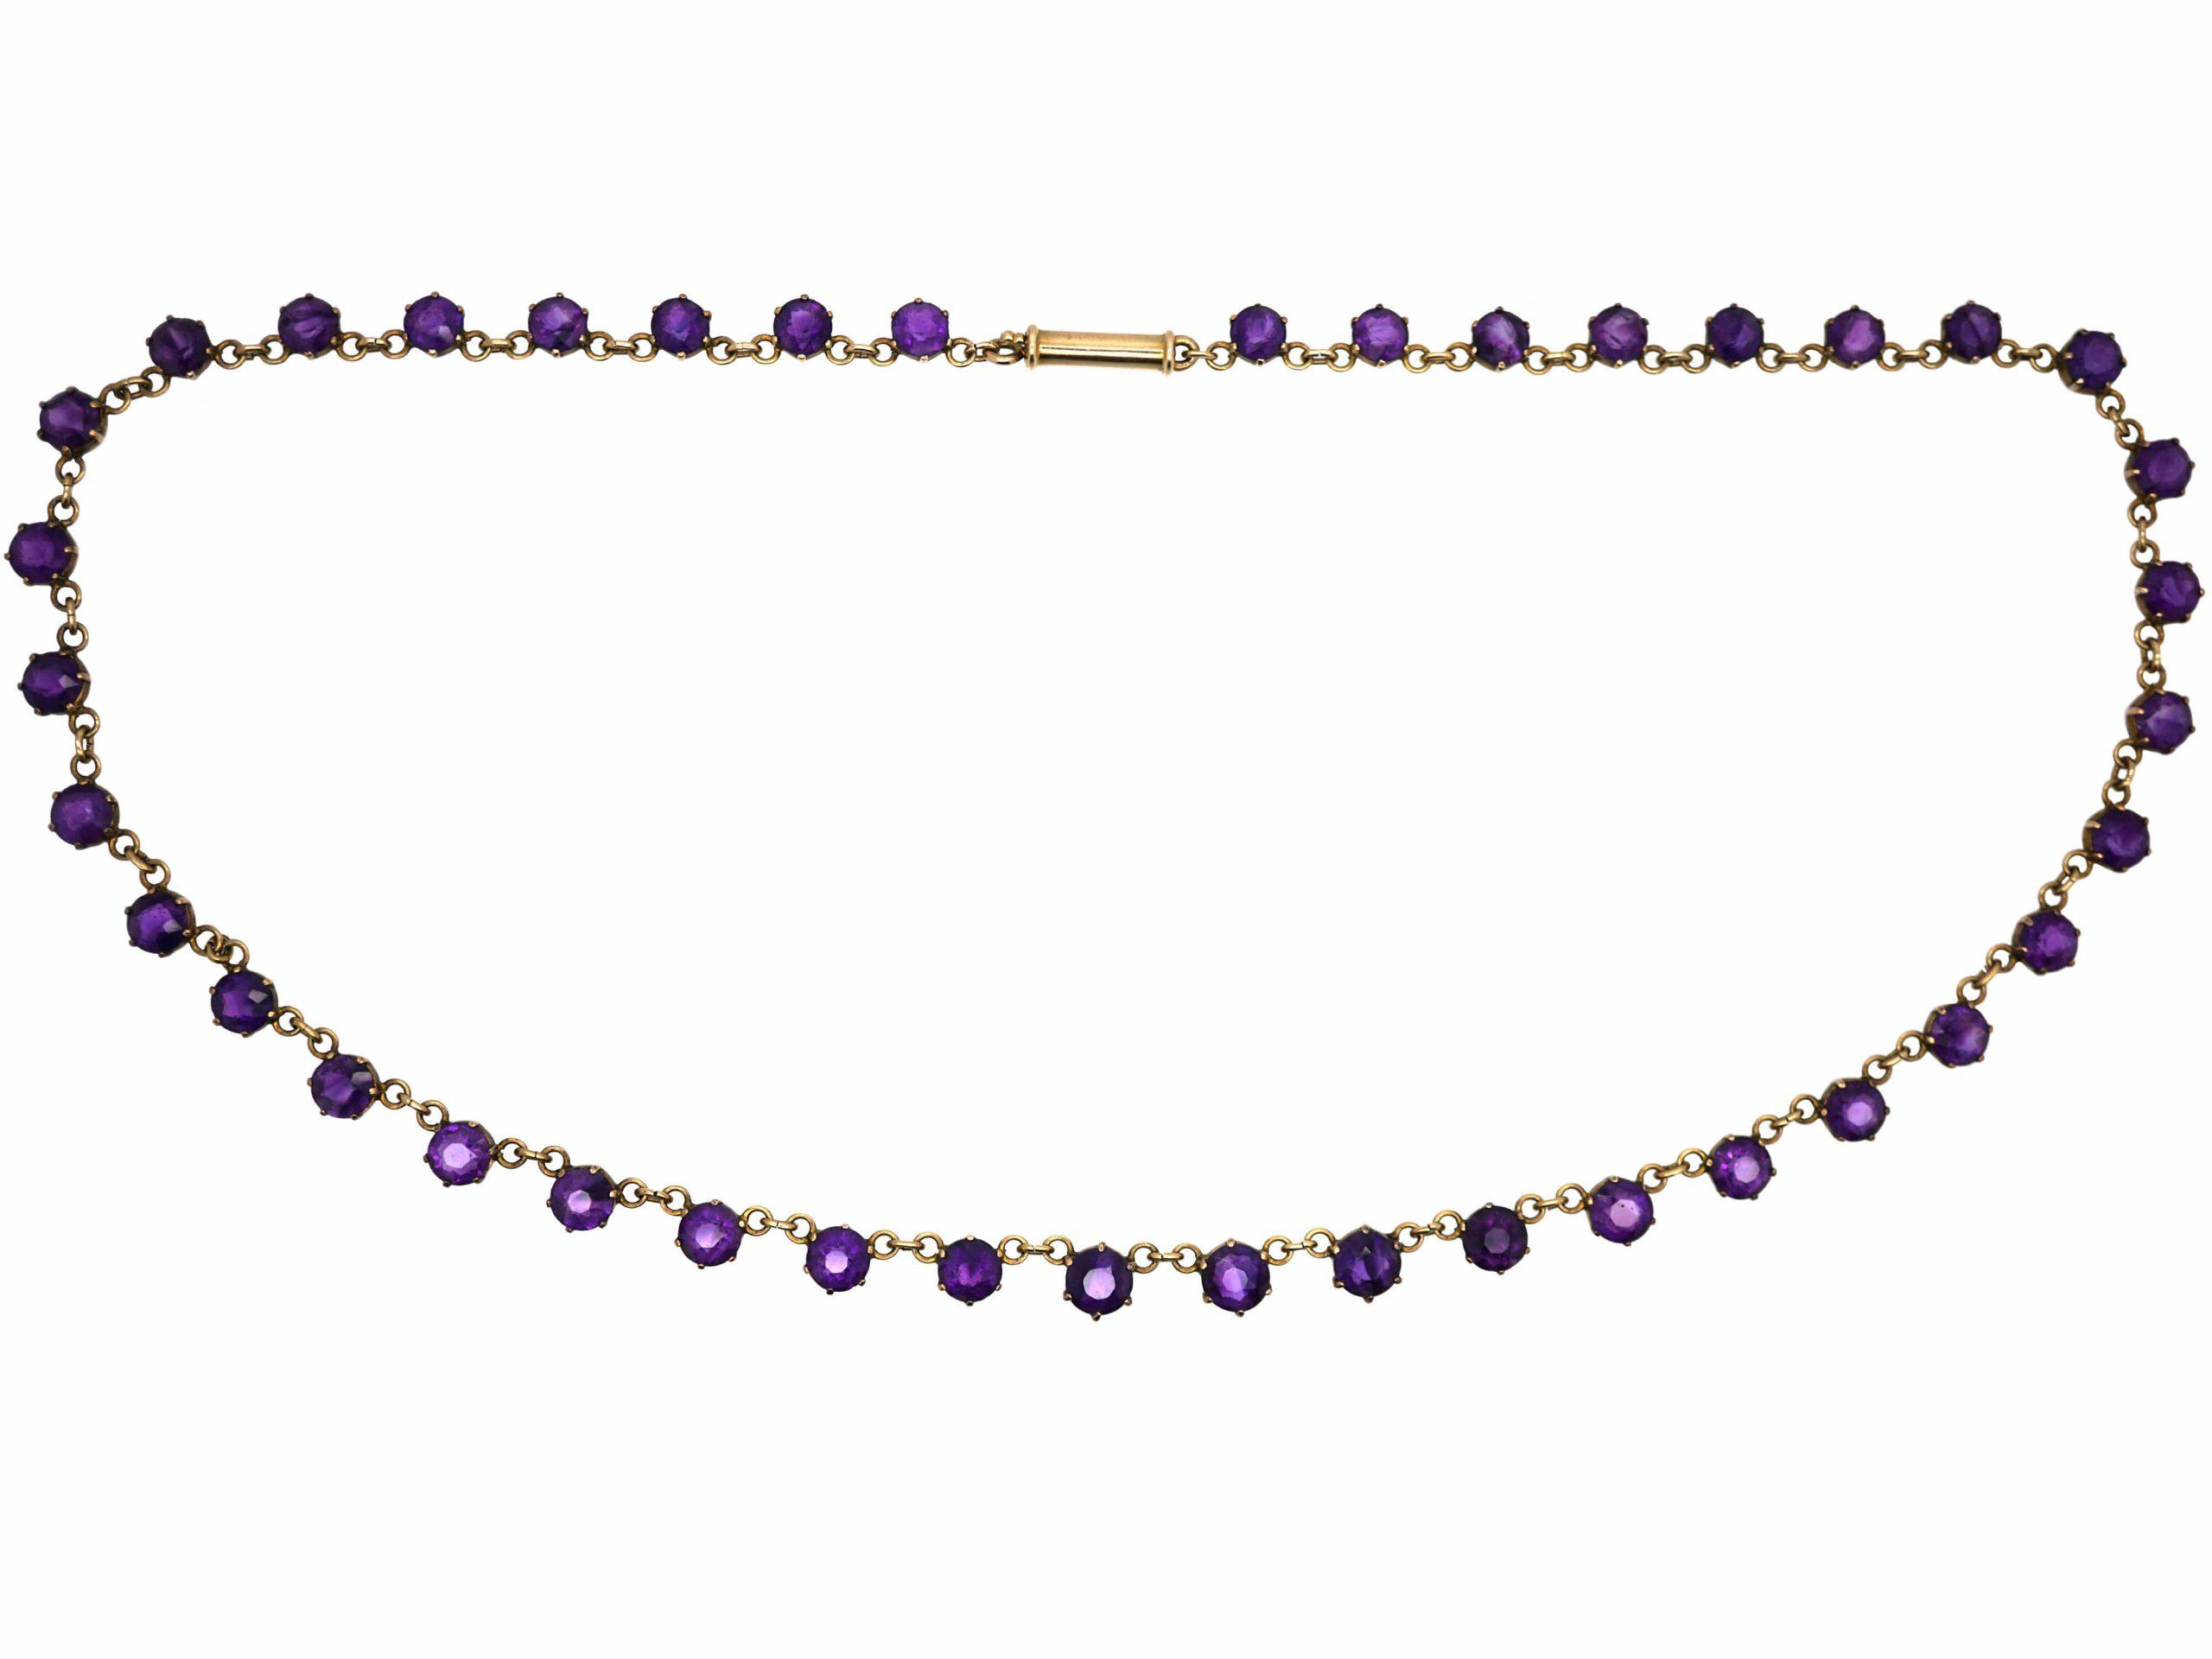 Edwardian 9ct Gold & Amethyst Necklace